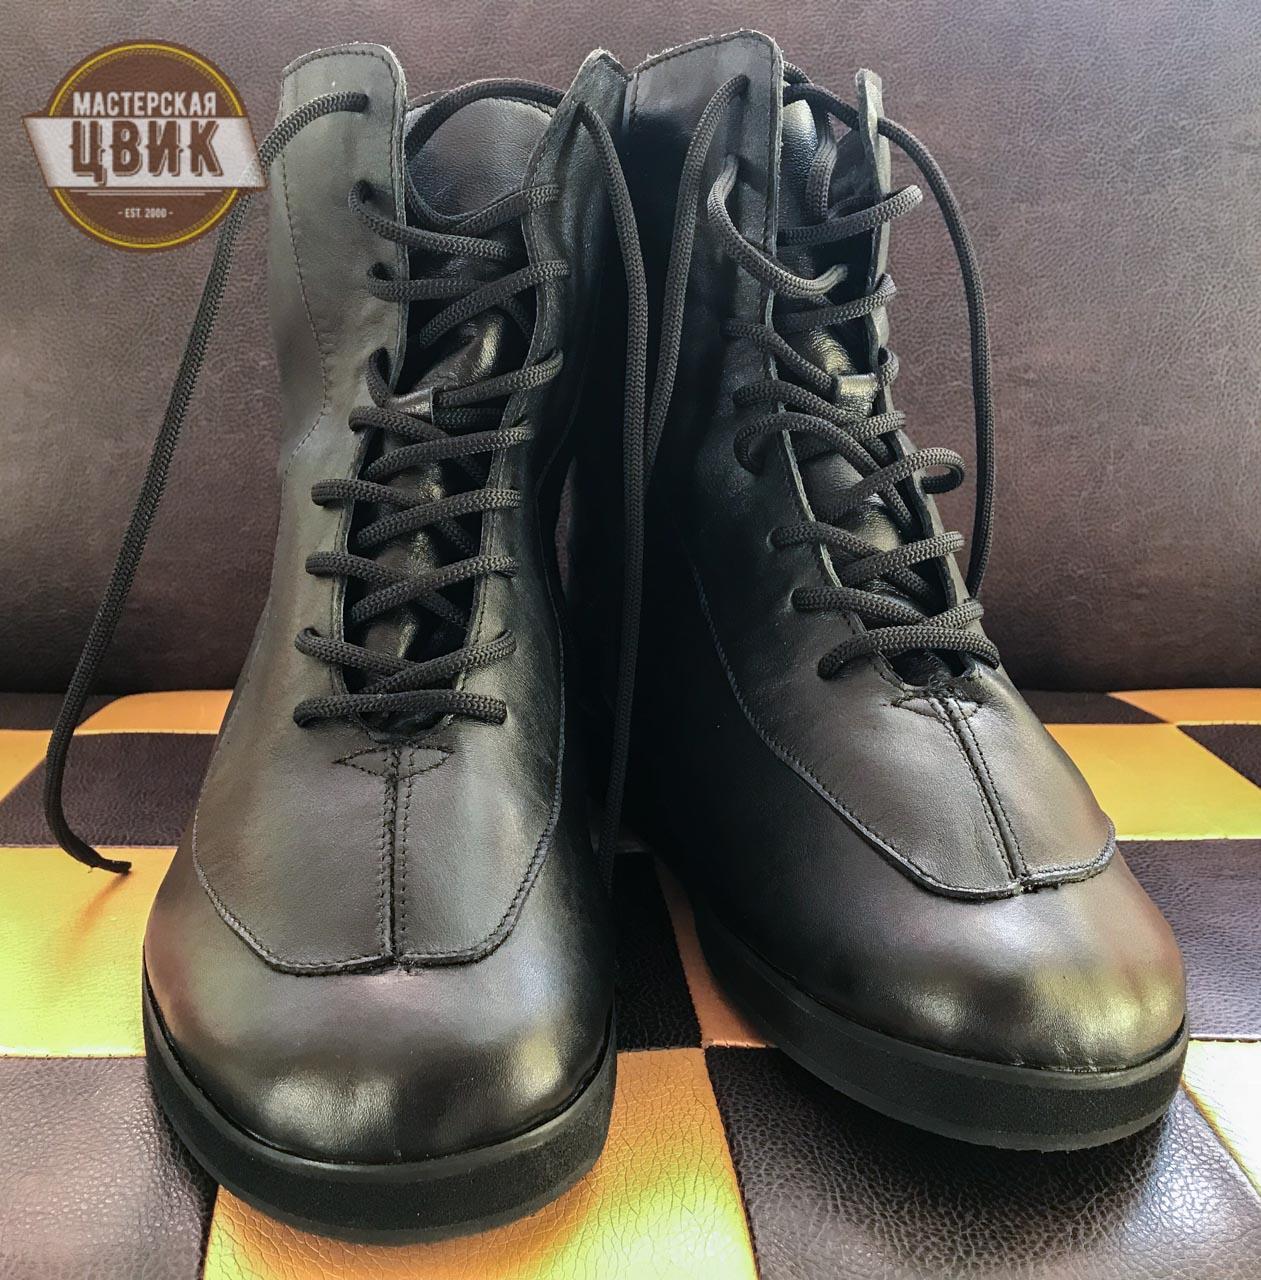 individualnyj-poshiv-obuvi-minsk-3 Индивидуальный пошив обуви